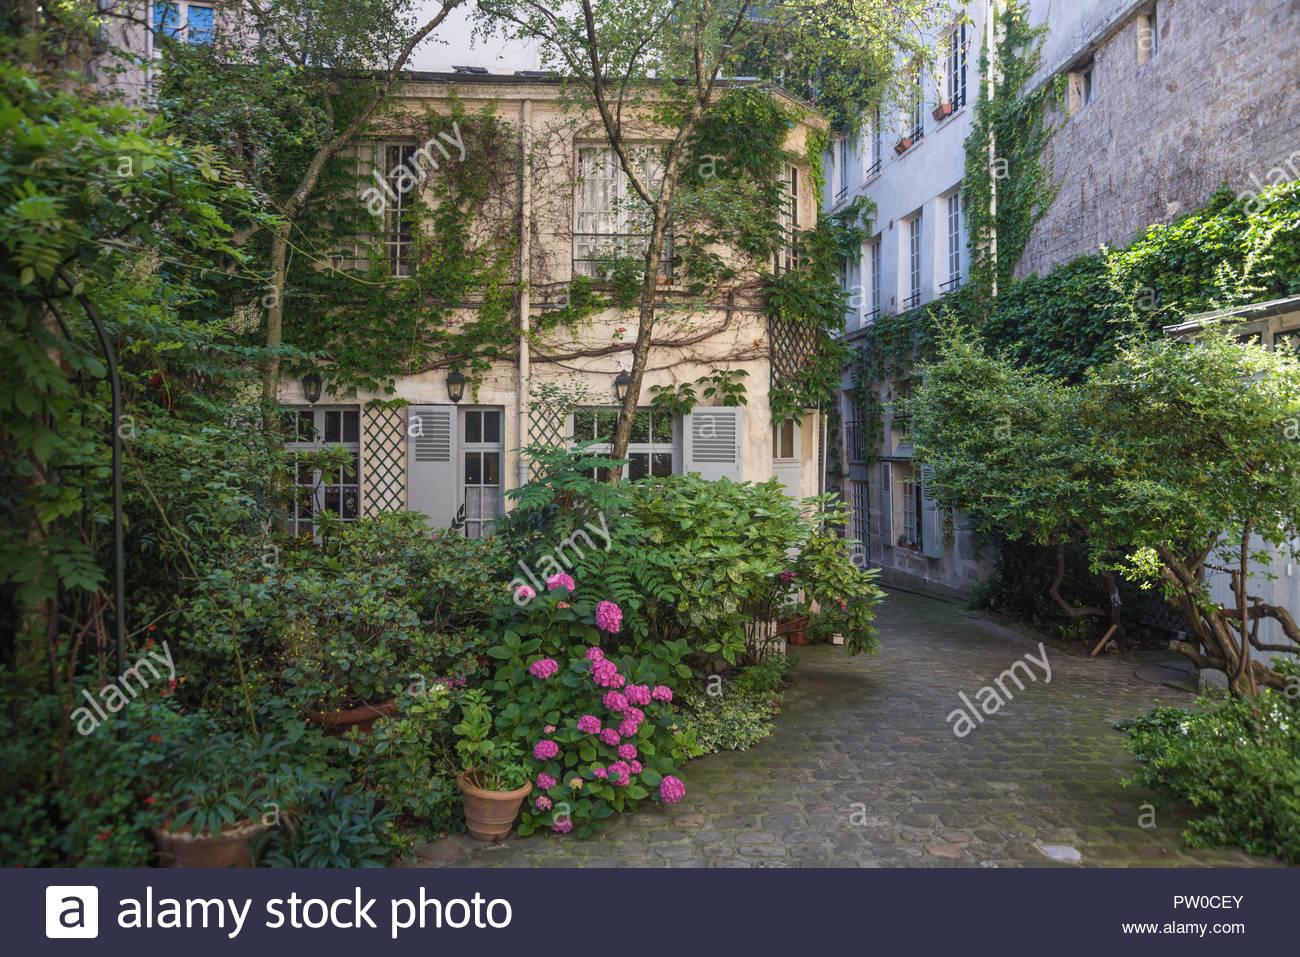 Parigi, Hinterhof 33 Rue de la Montagne, Seminaire des trente-trois, Kollegium der Dreiunddreissig (Priesterseminar) (Das Kollegium der Dreiunddreissig Immagini Stock